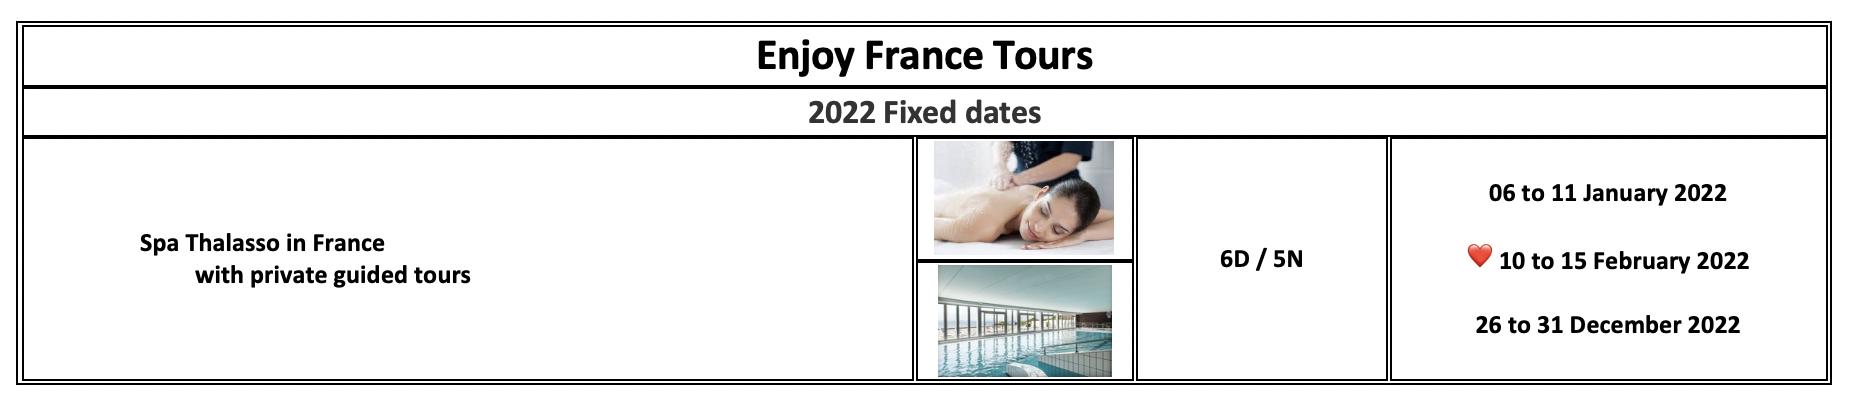 Enjoy France Tours 2022 Spa Thalasso